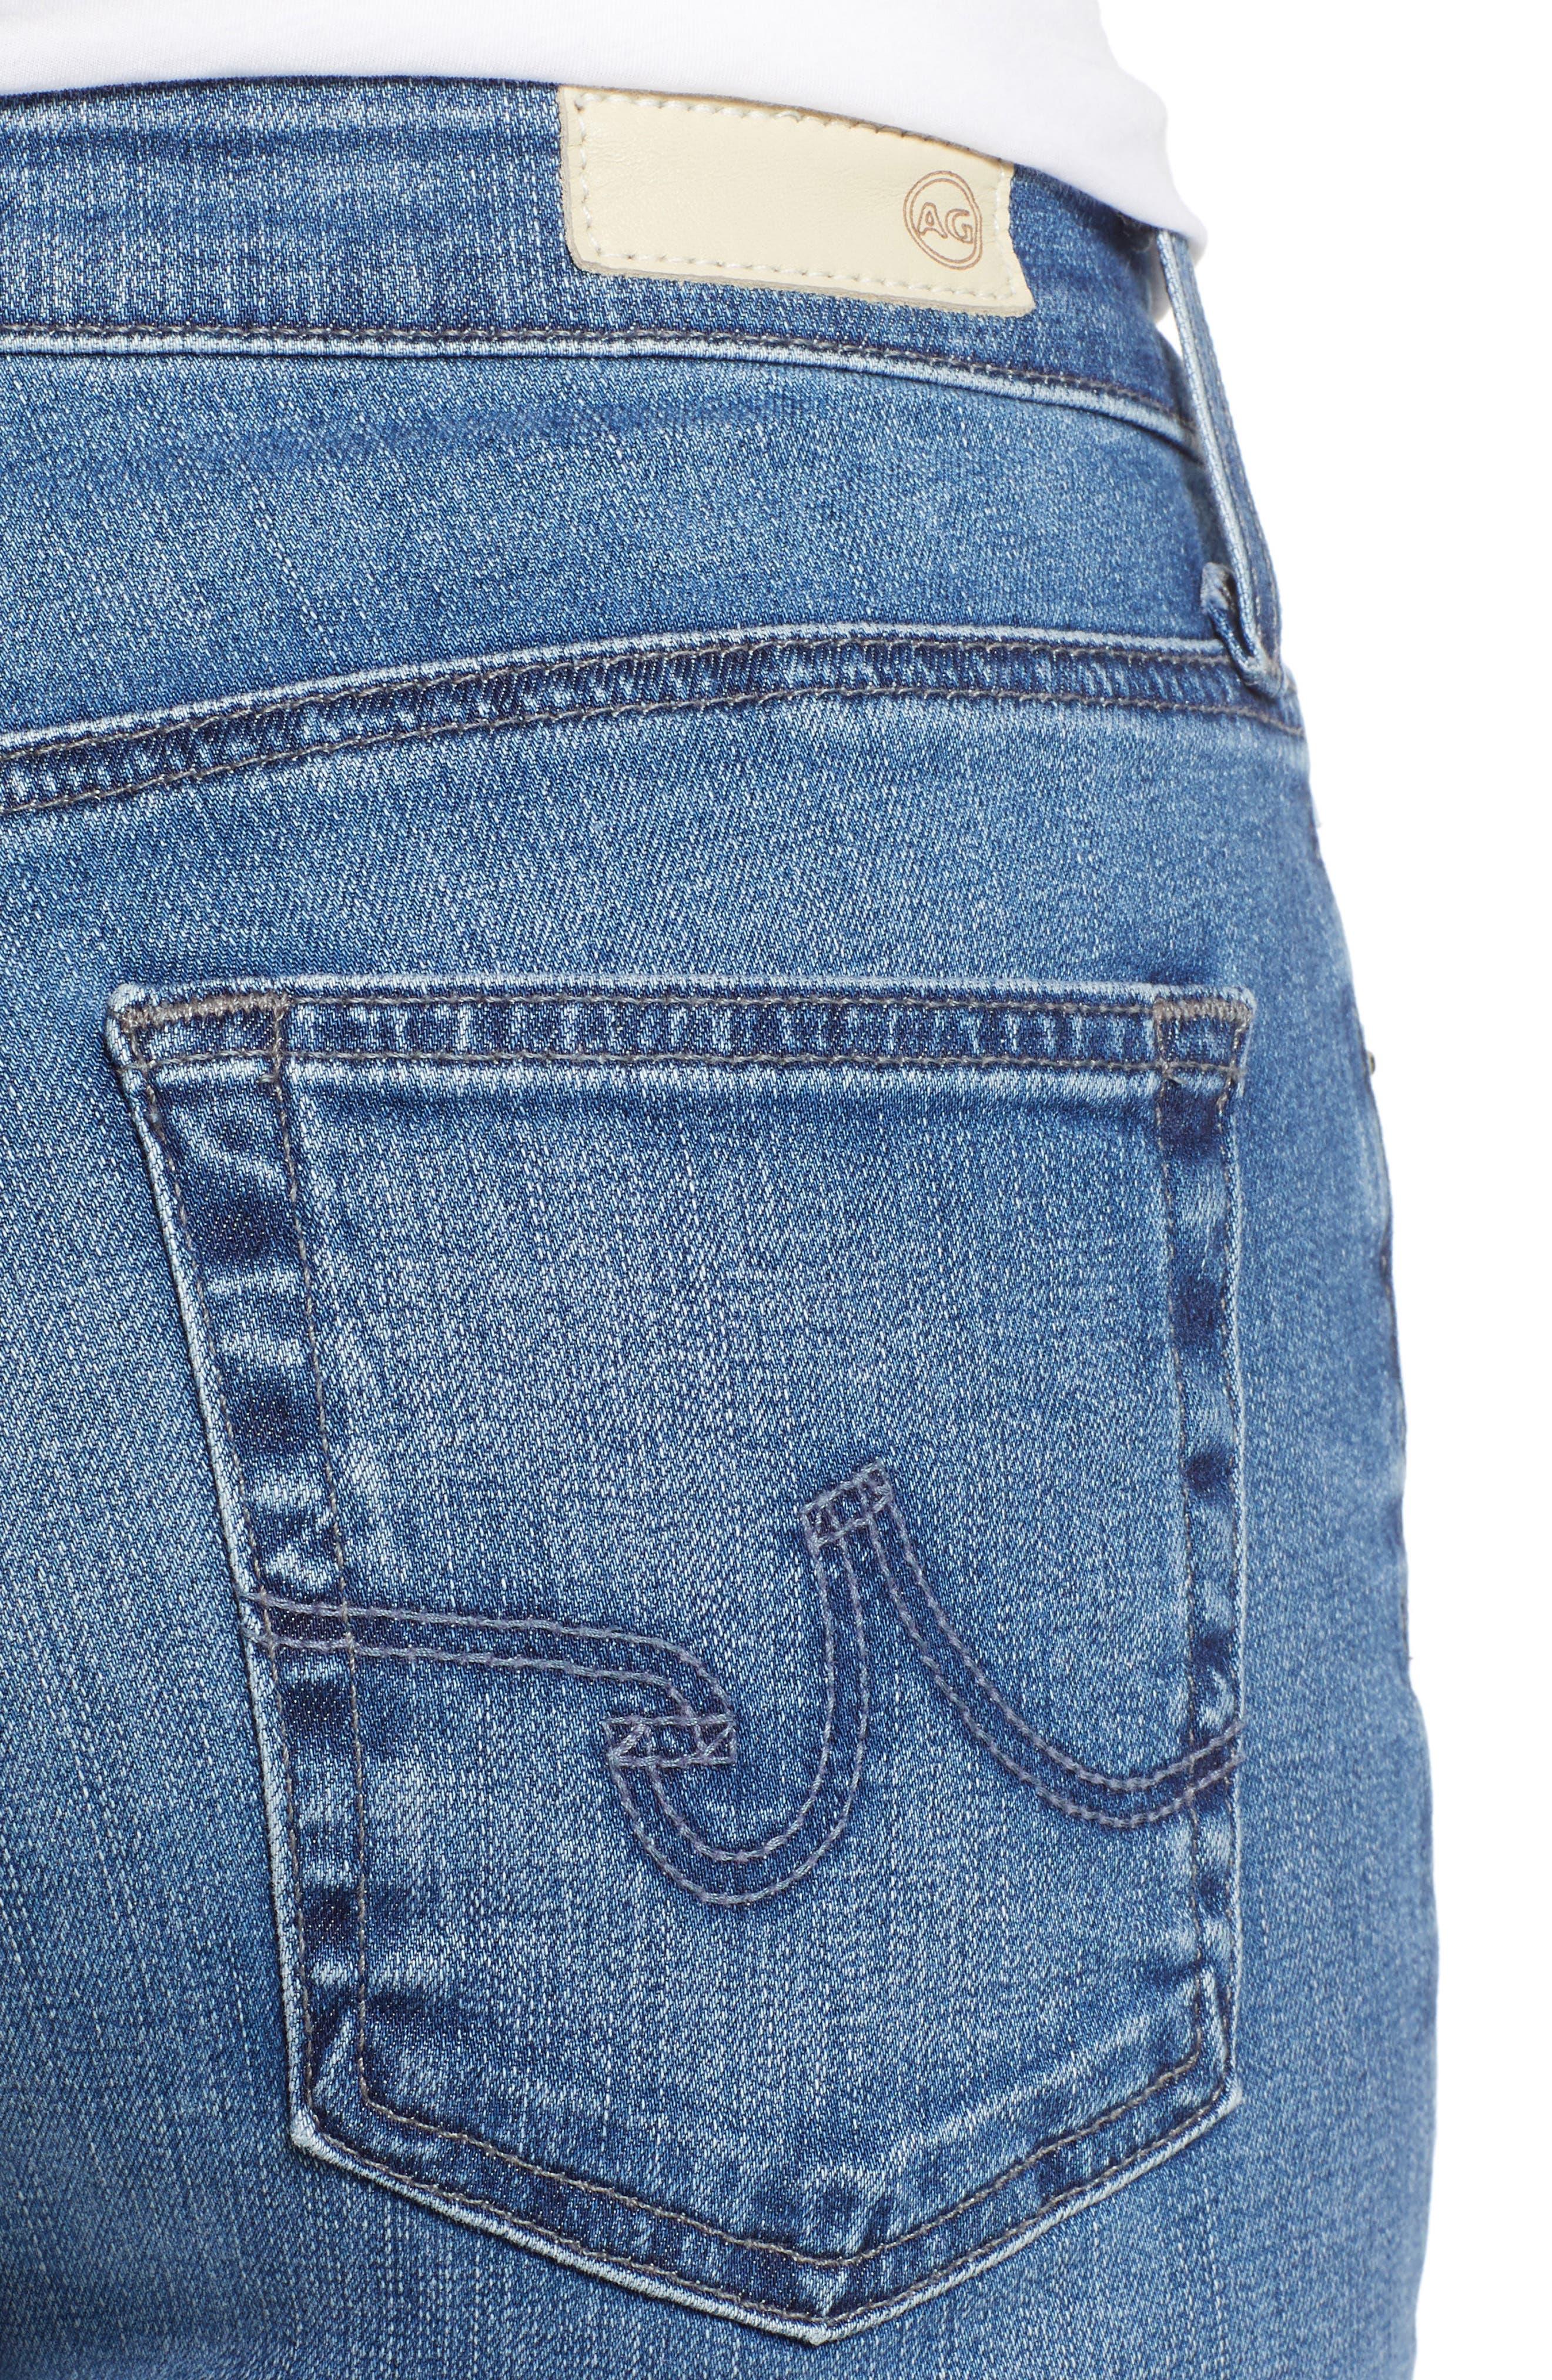 'The Farrah' High Rise Skinny Jeans,                             Alternate thumbnail 37, color,